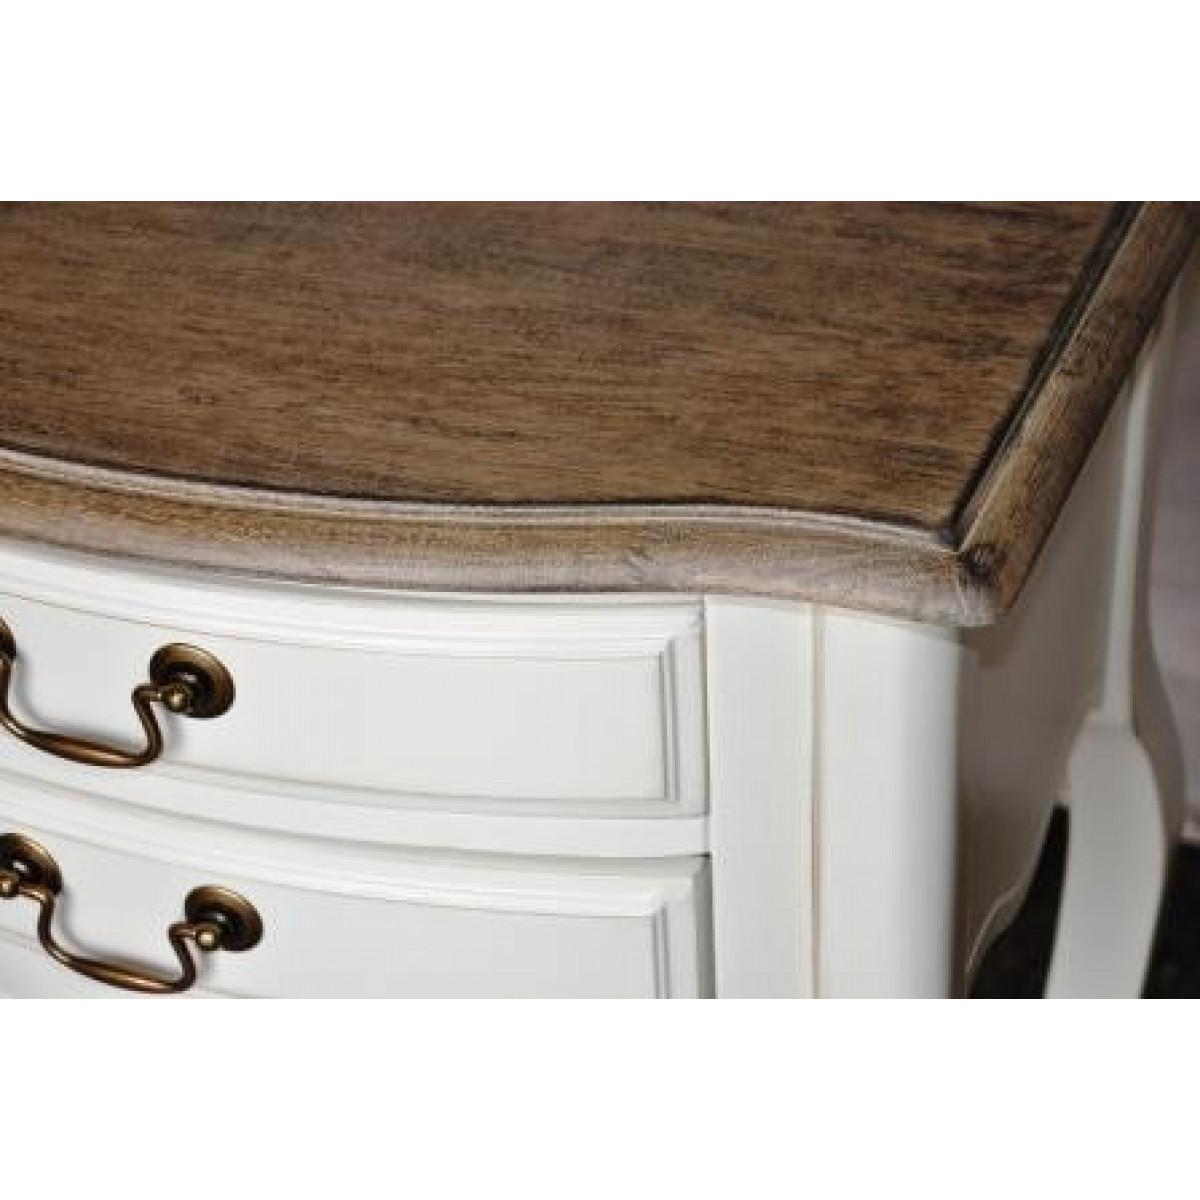 H804 (H03+H01) Прикроватная тумбаколлекция Marsel & Chateau